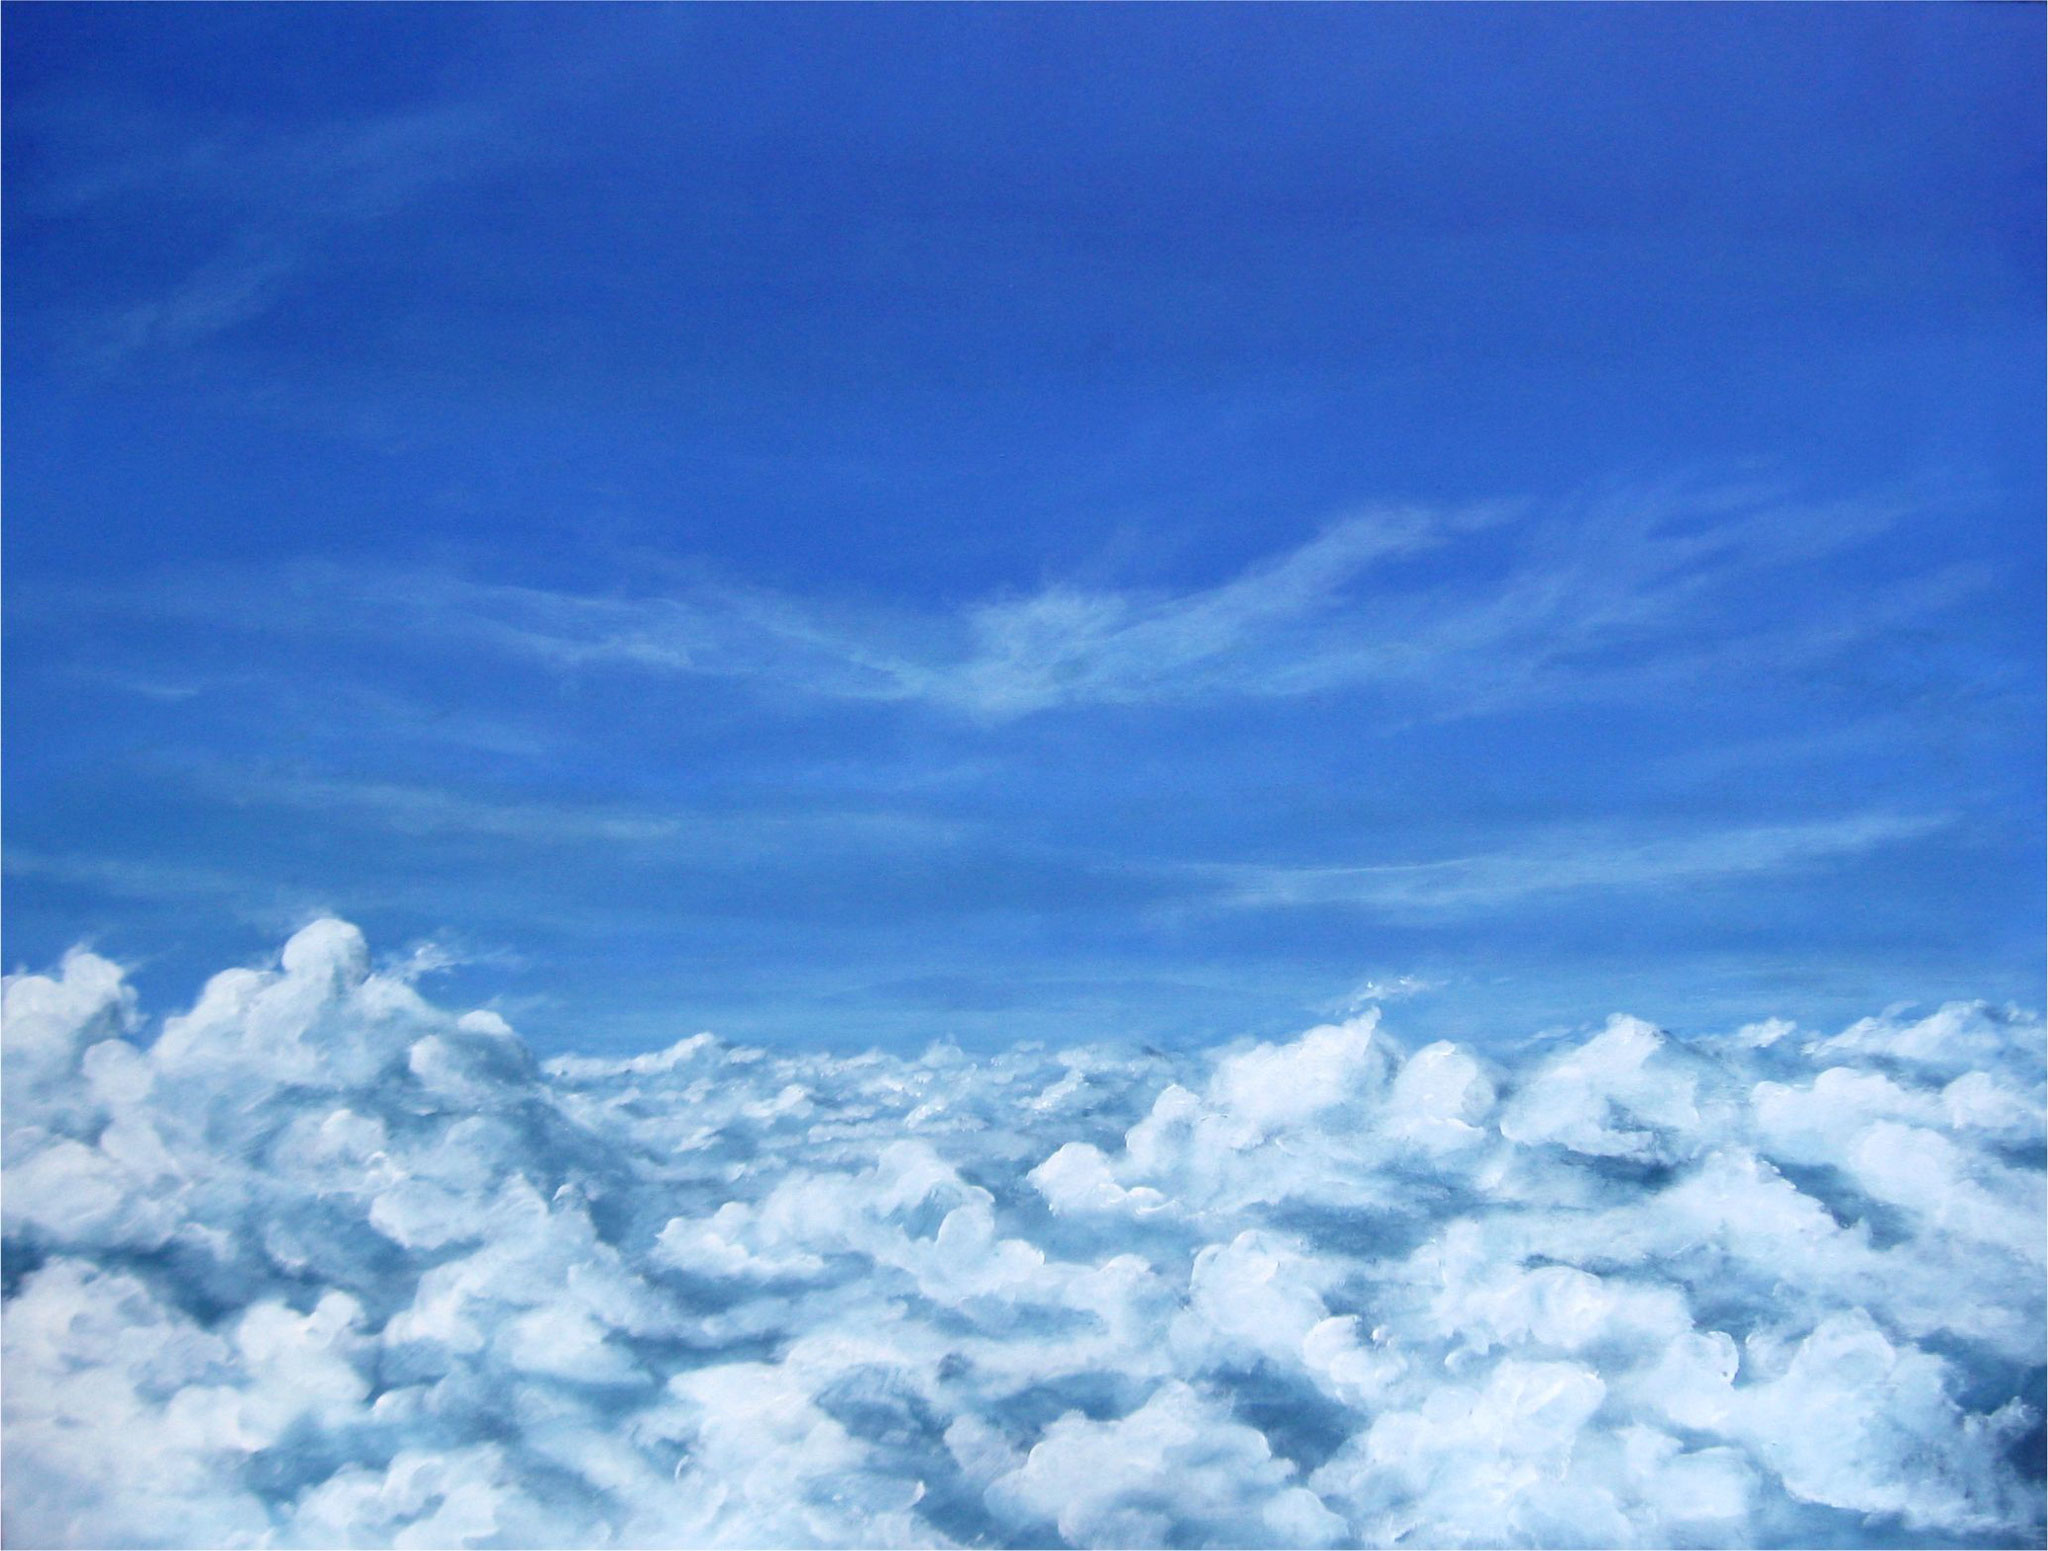 The cloud 4.0